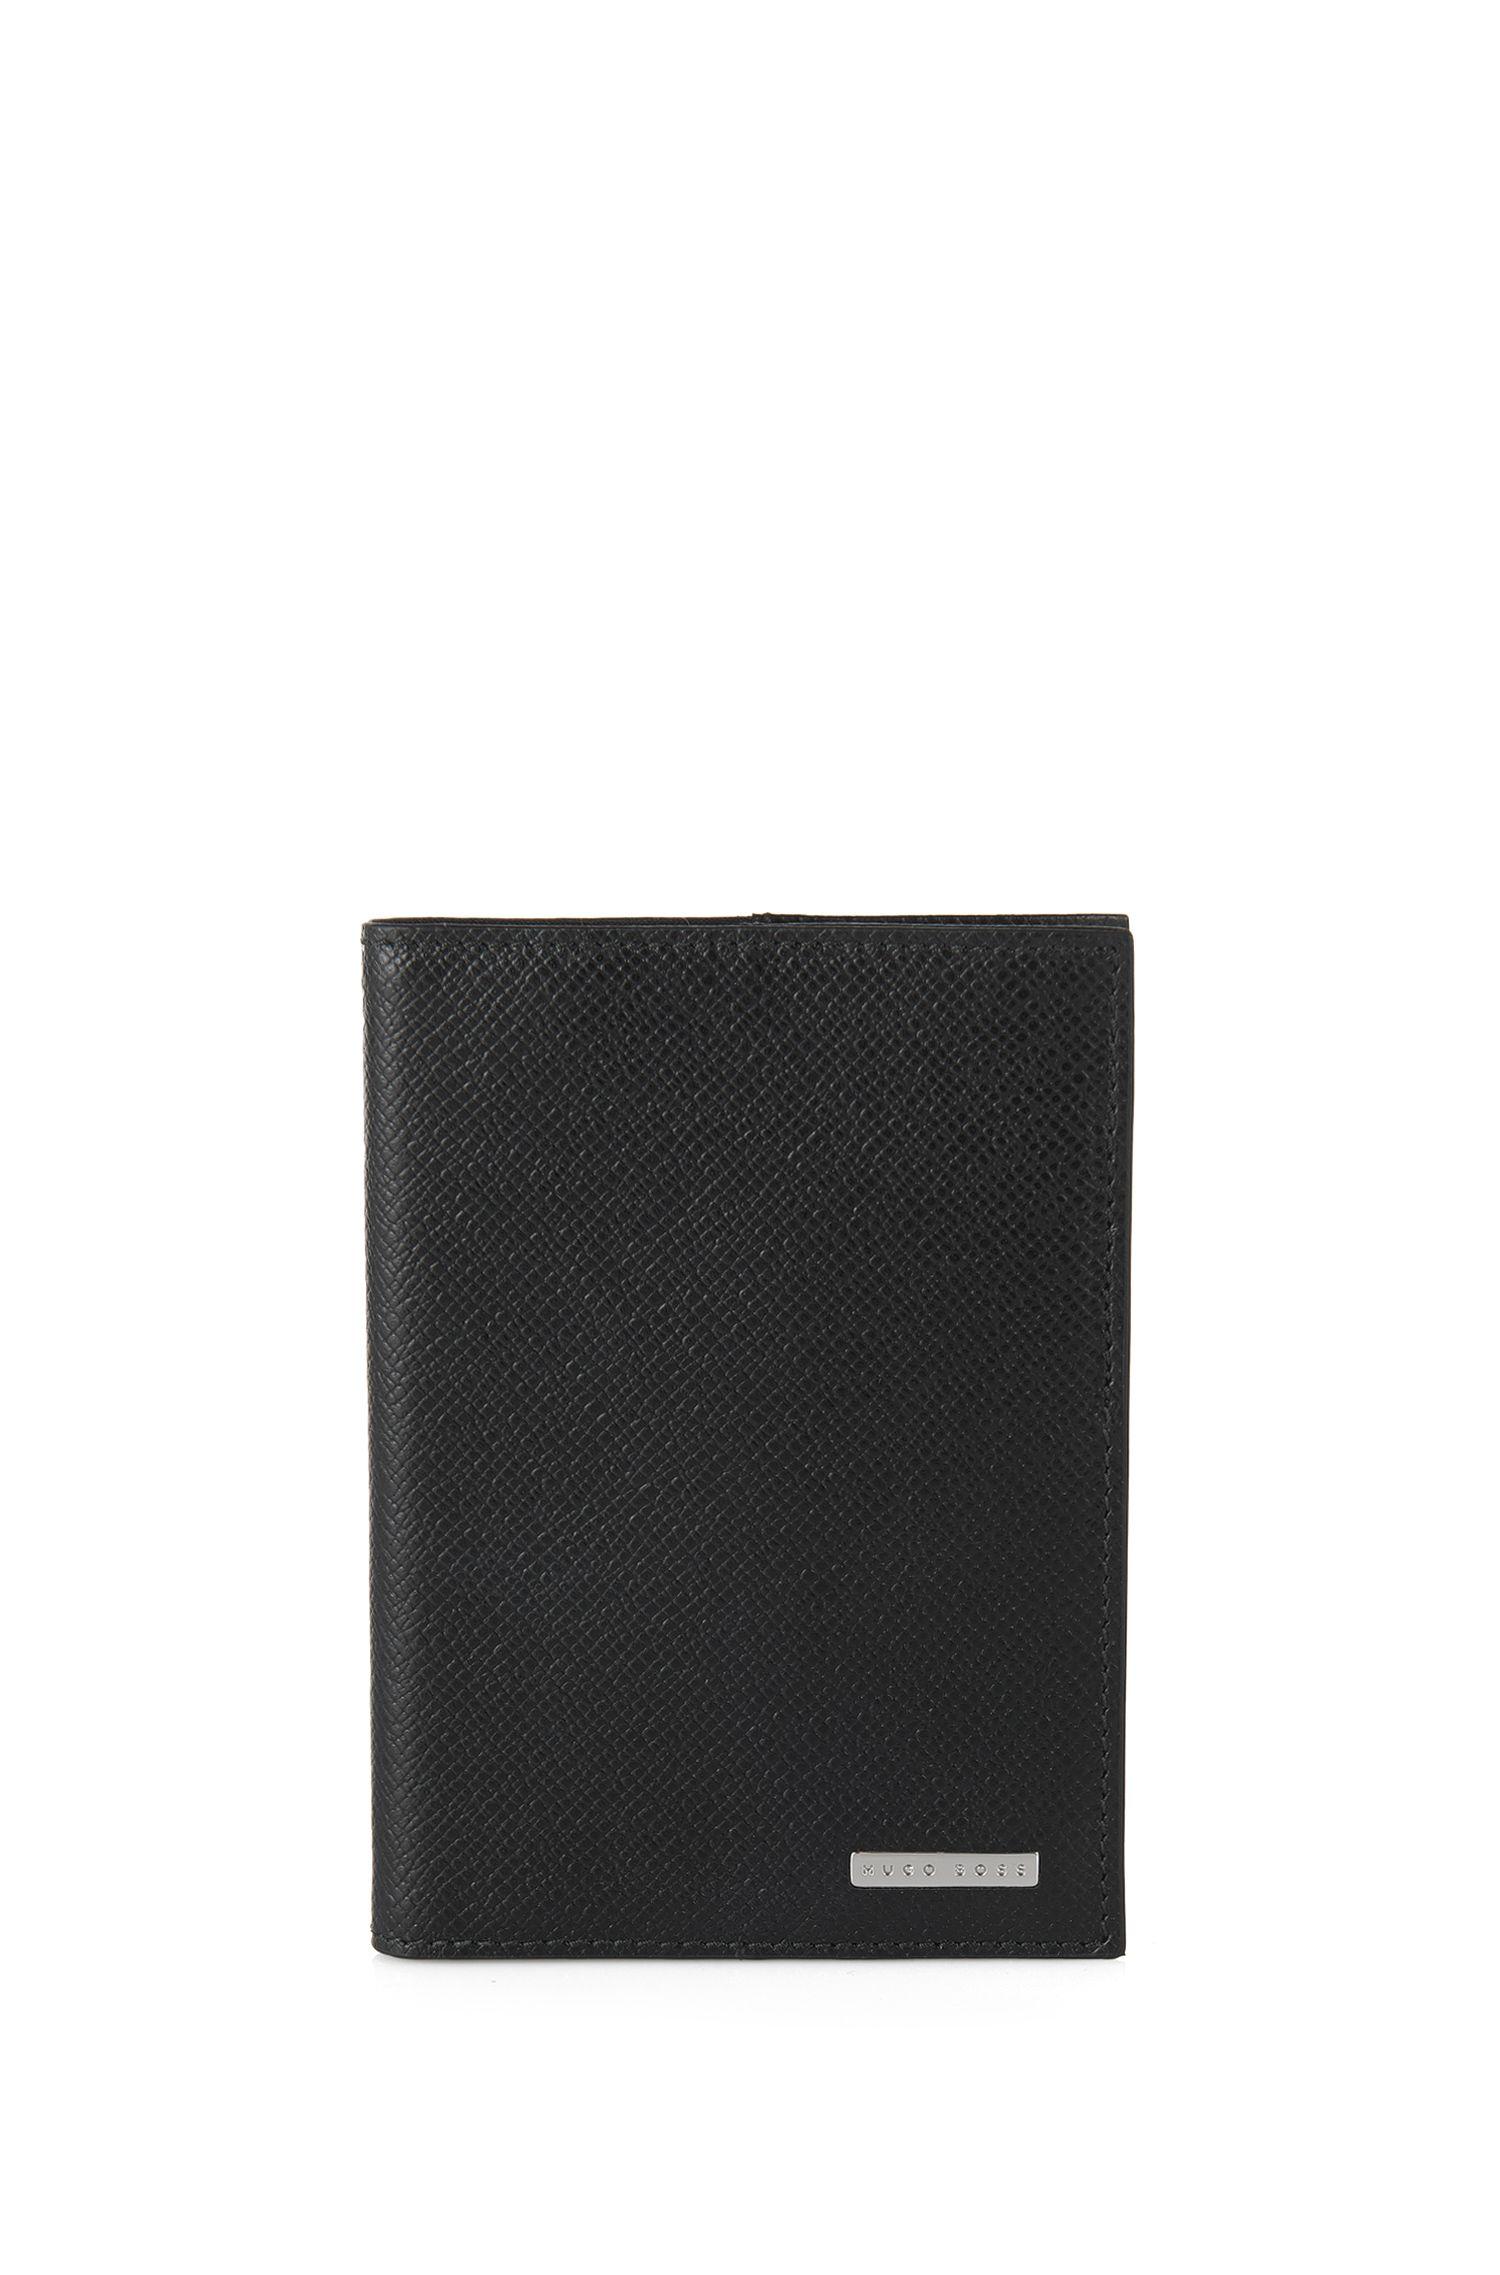 Reisepass-Etui aus strukturiertem Leder: 'Siganture_Passport'